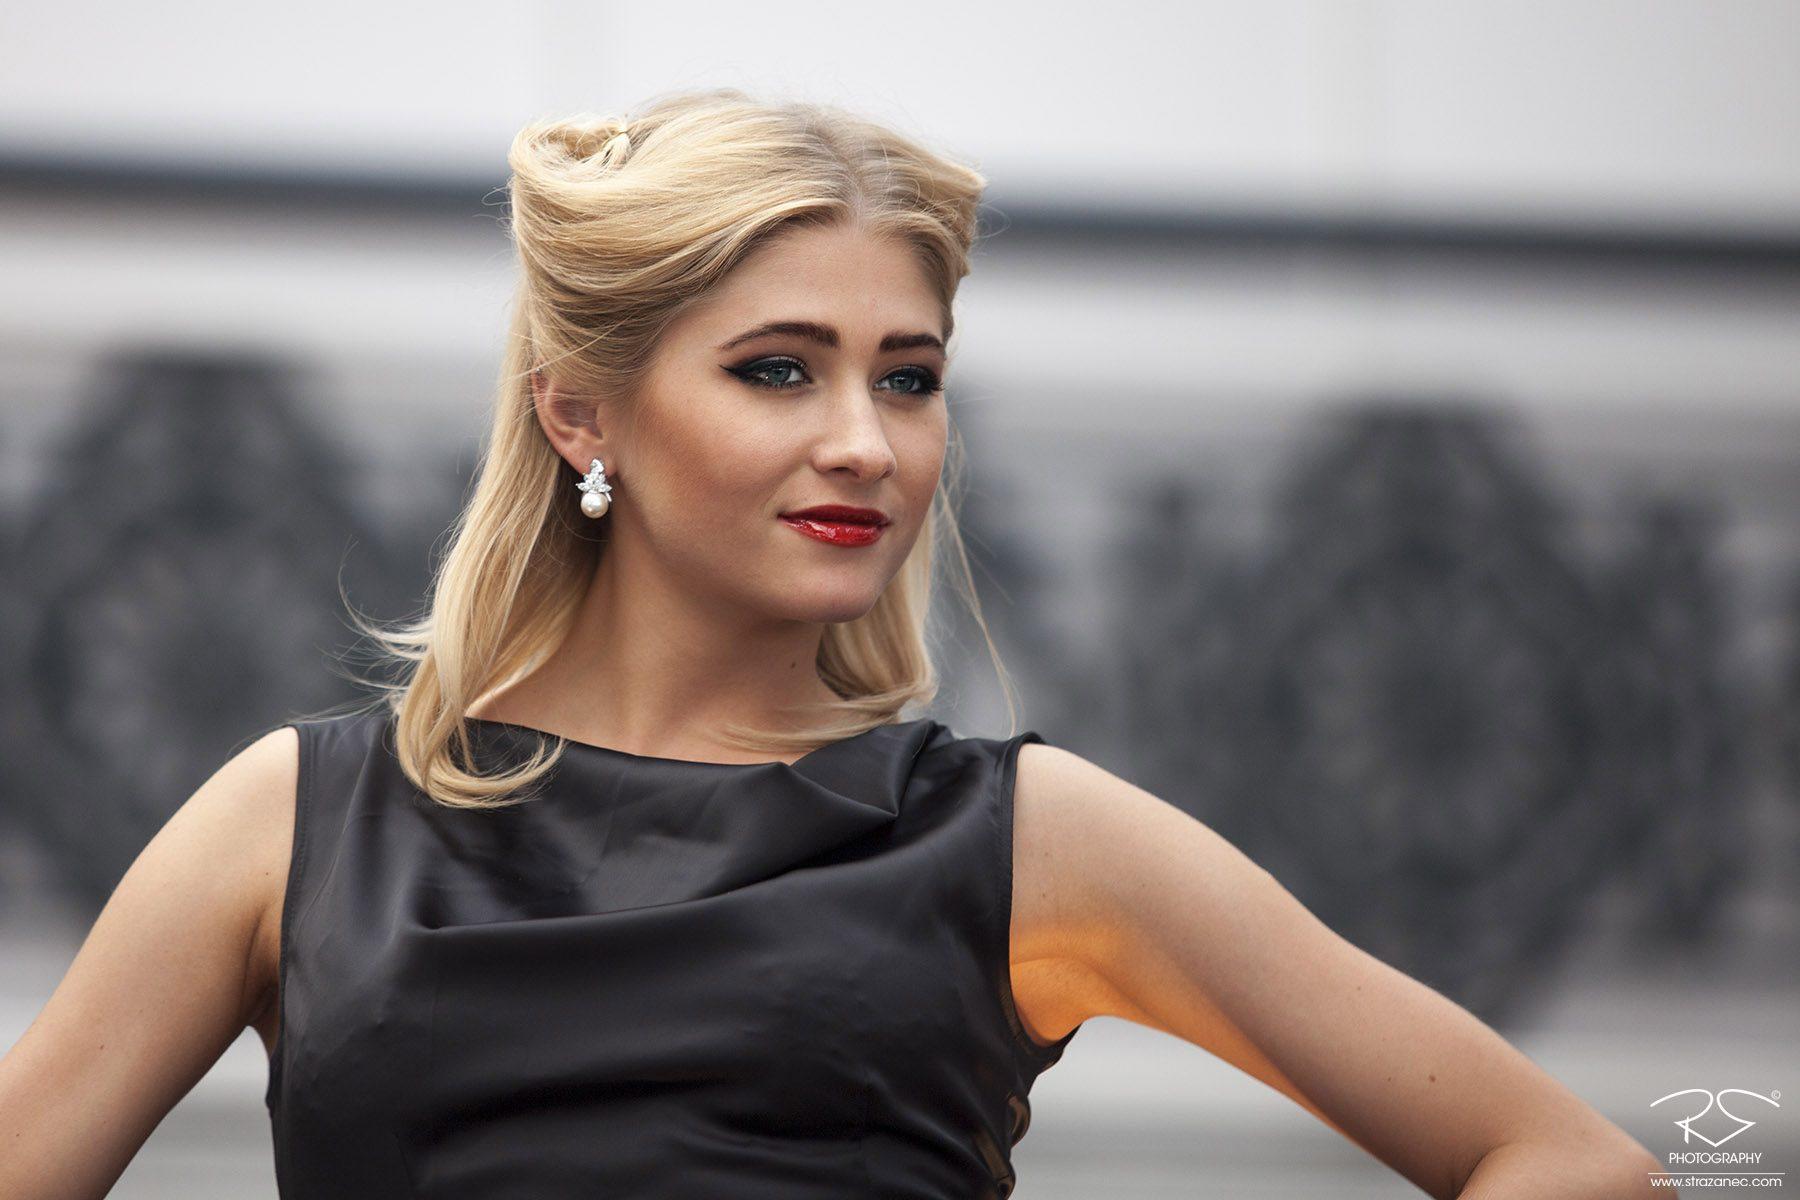 strazanec photography- blond model